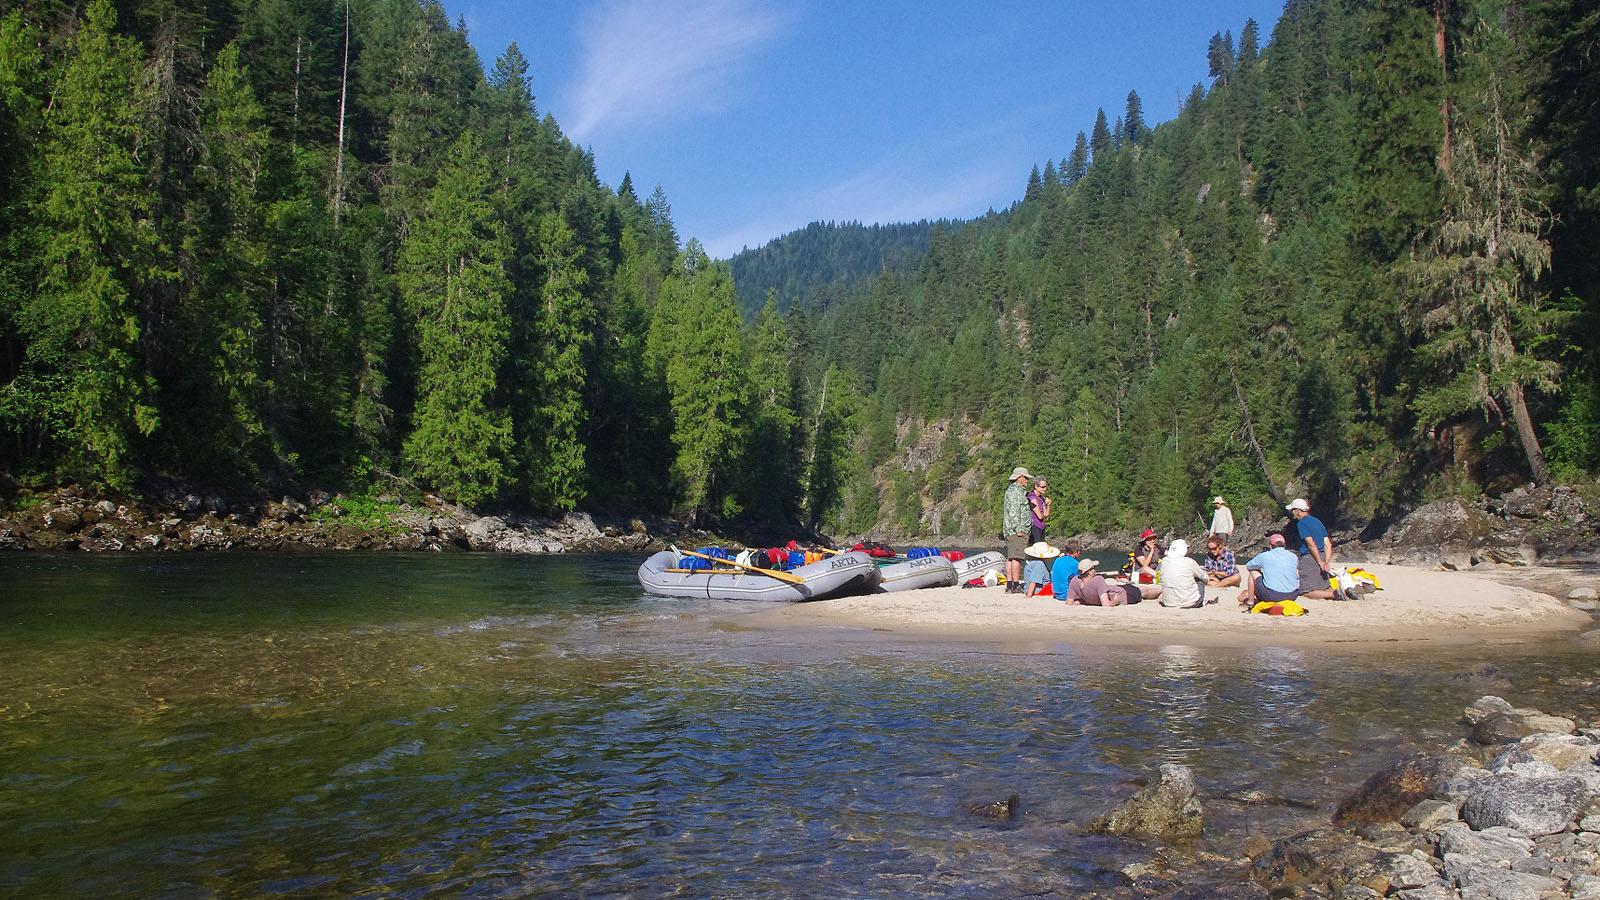 A lunch break along the Selway River in Idaho